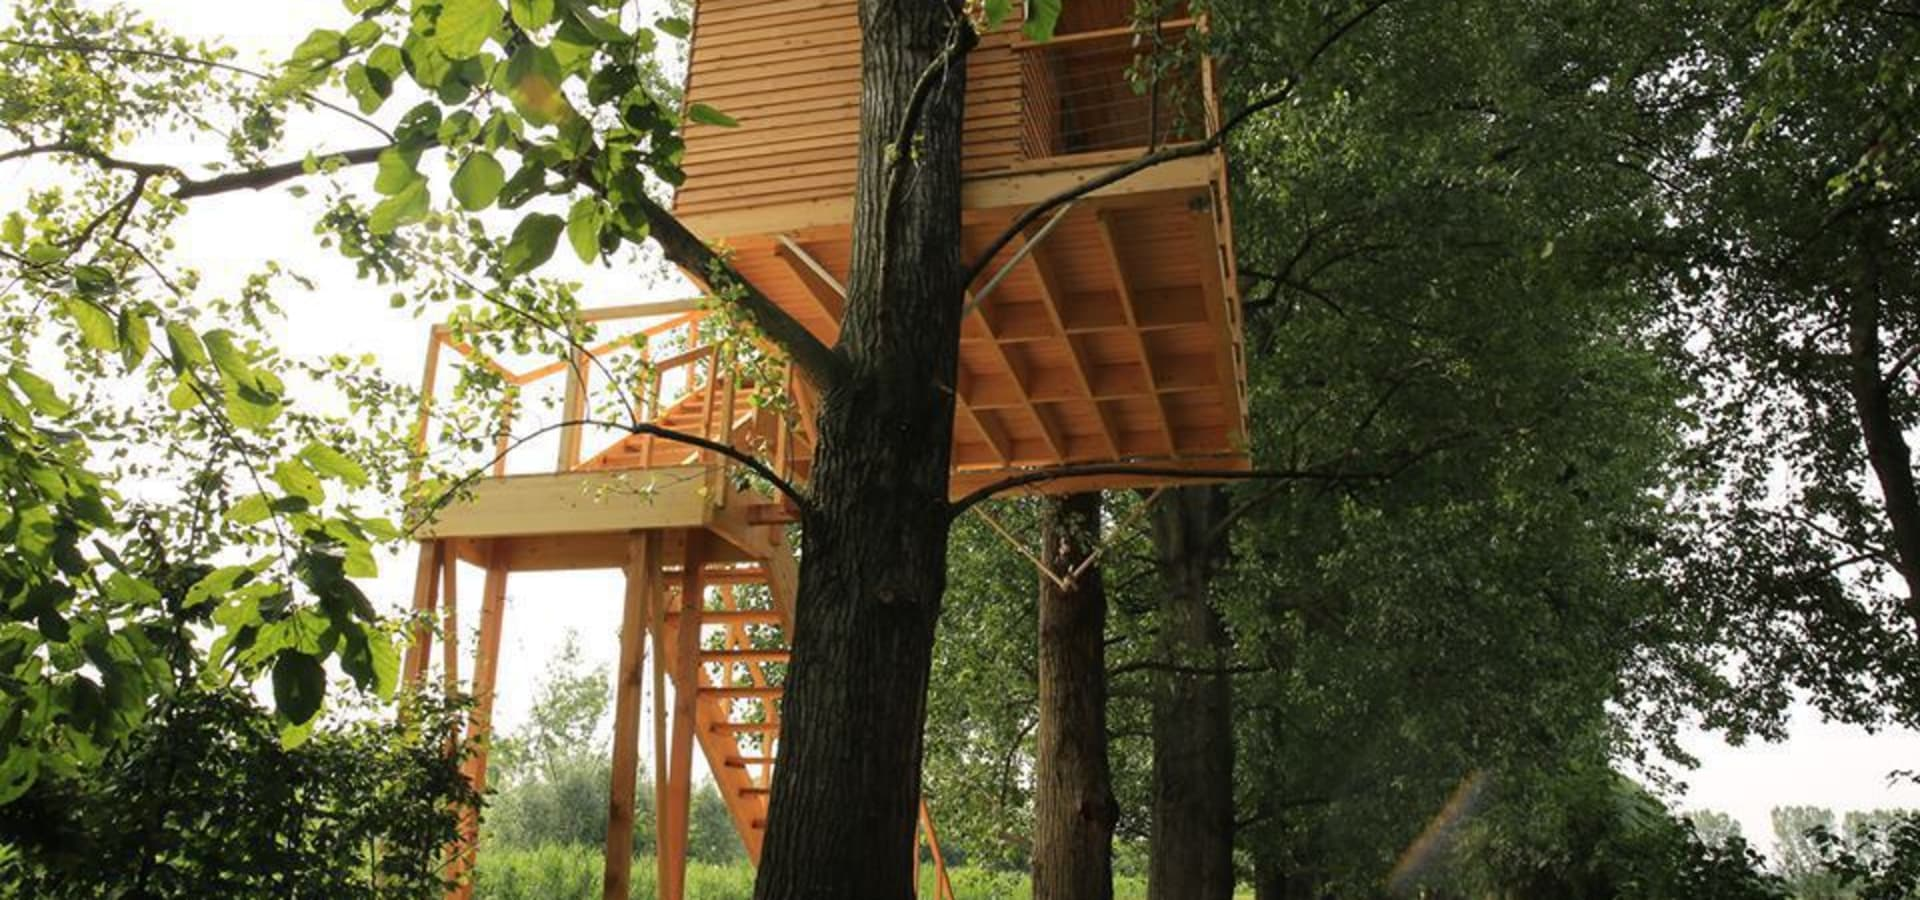 Nicola Preti – Architecture, Planning and Preservation-